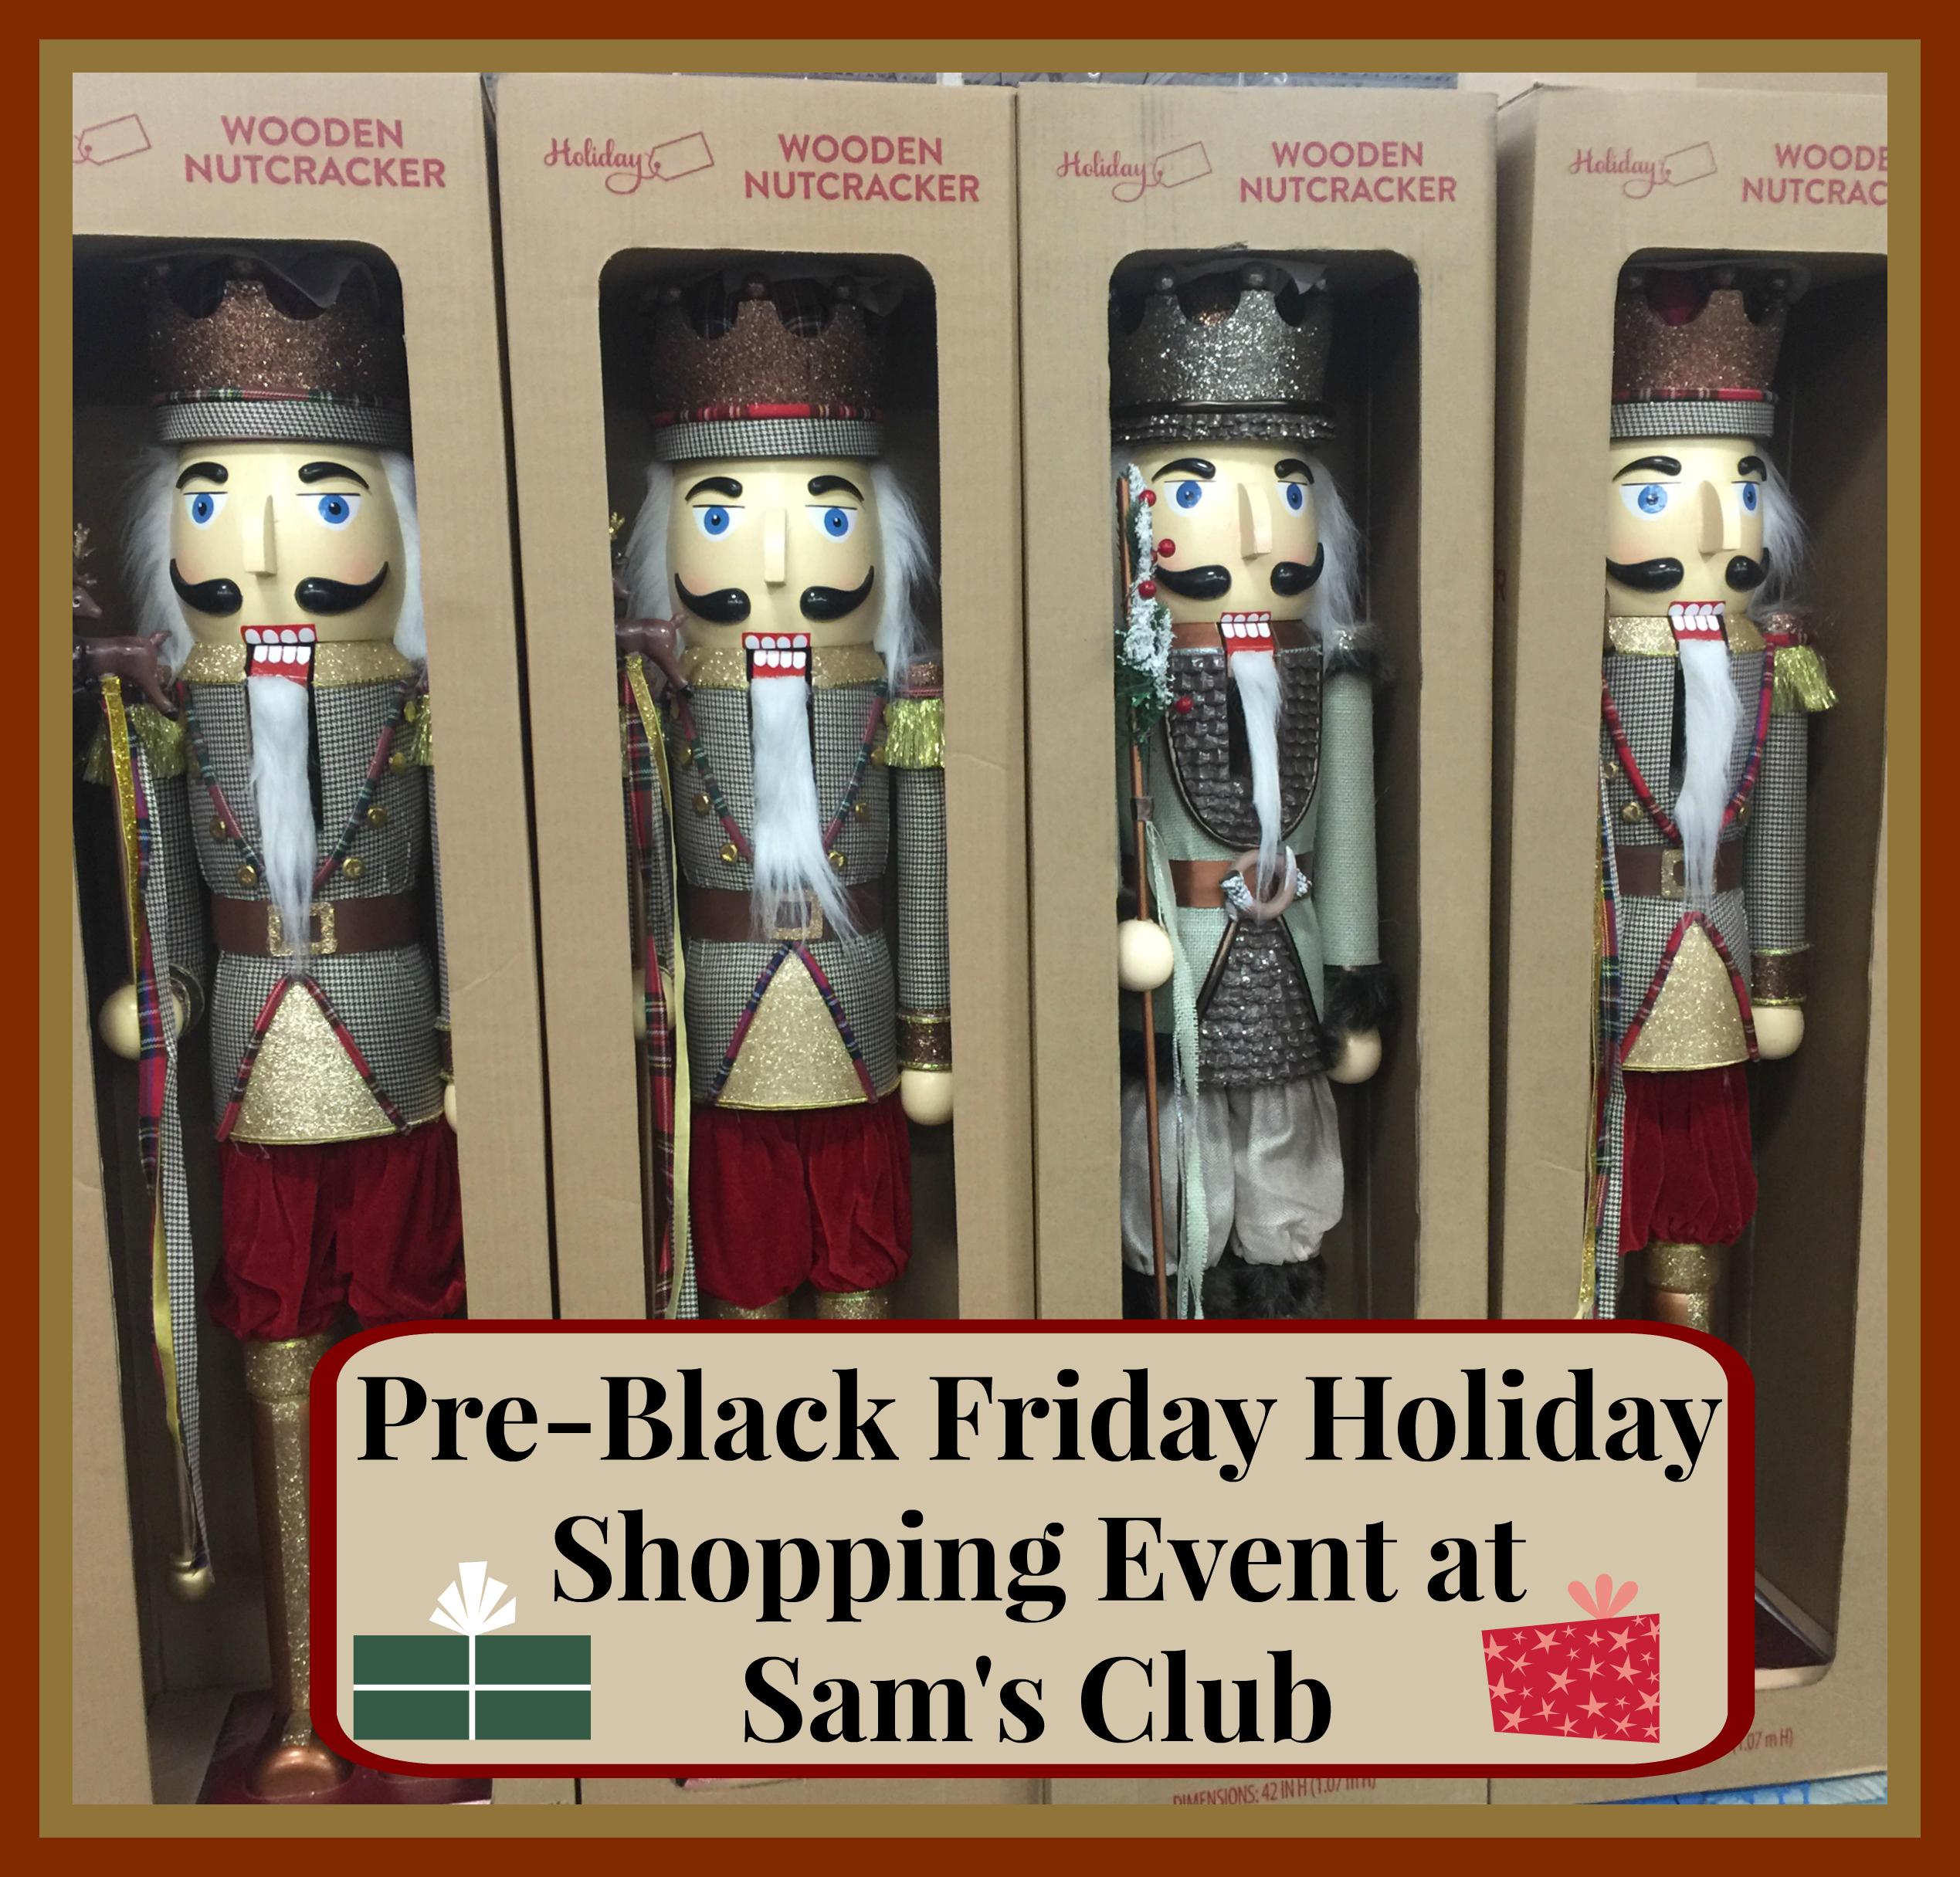 #SamsClubHoilday #Holiday #ad